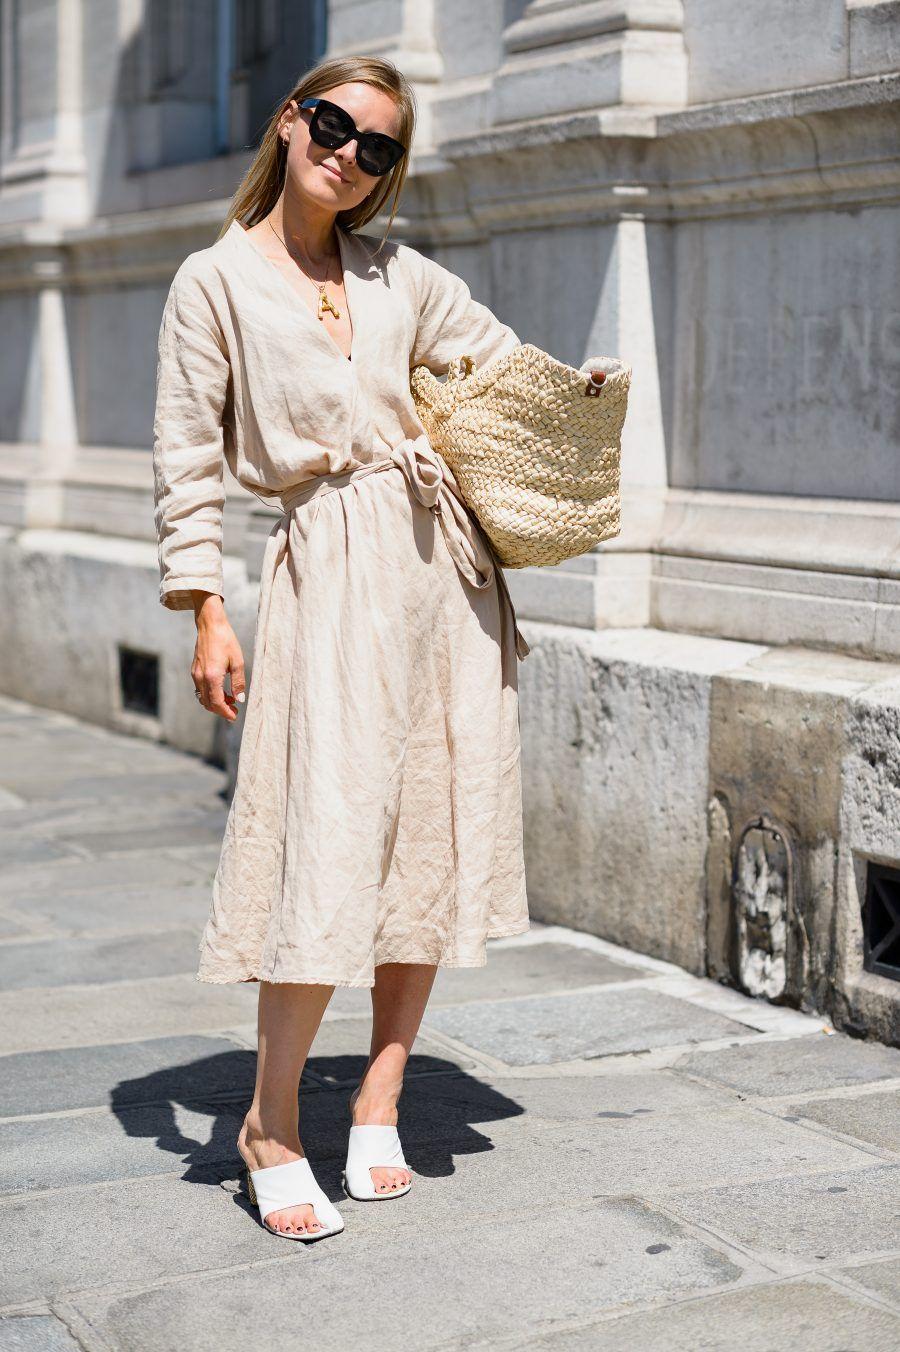 c27ed27b268 Zara linen dress new collection 2018